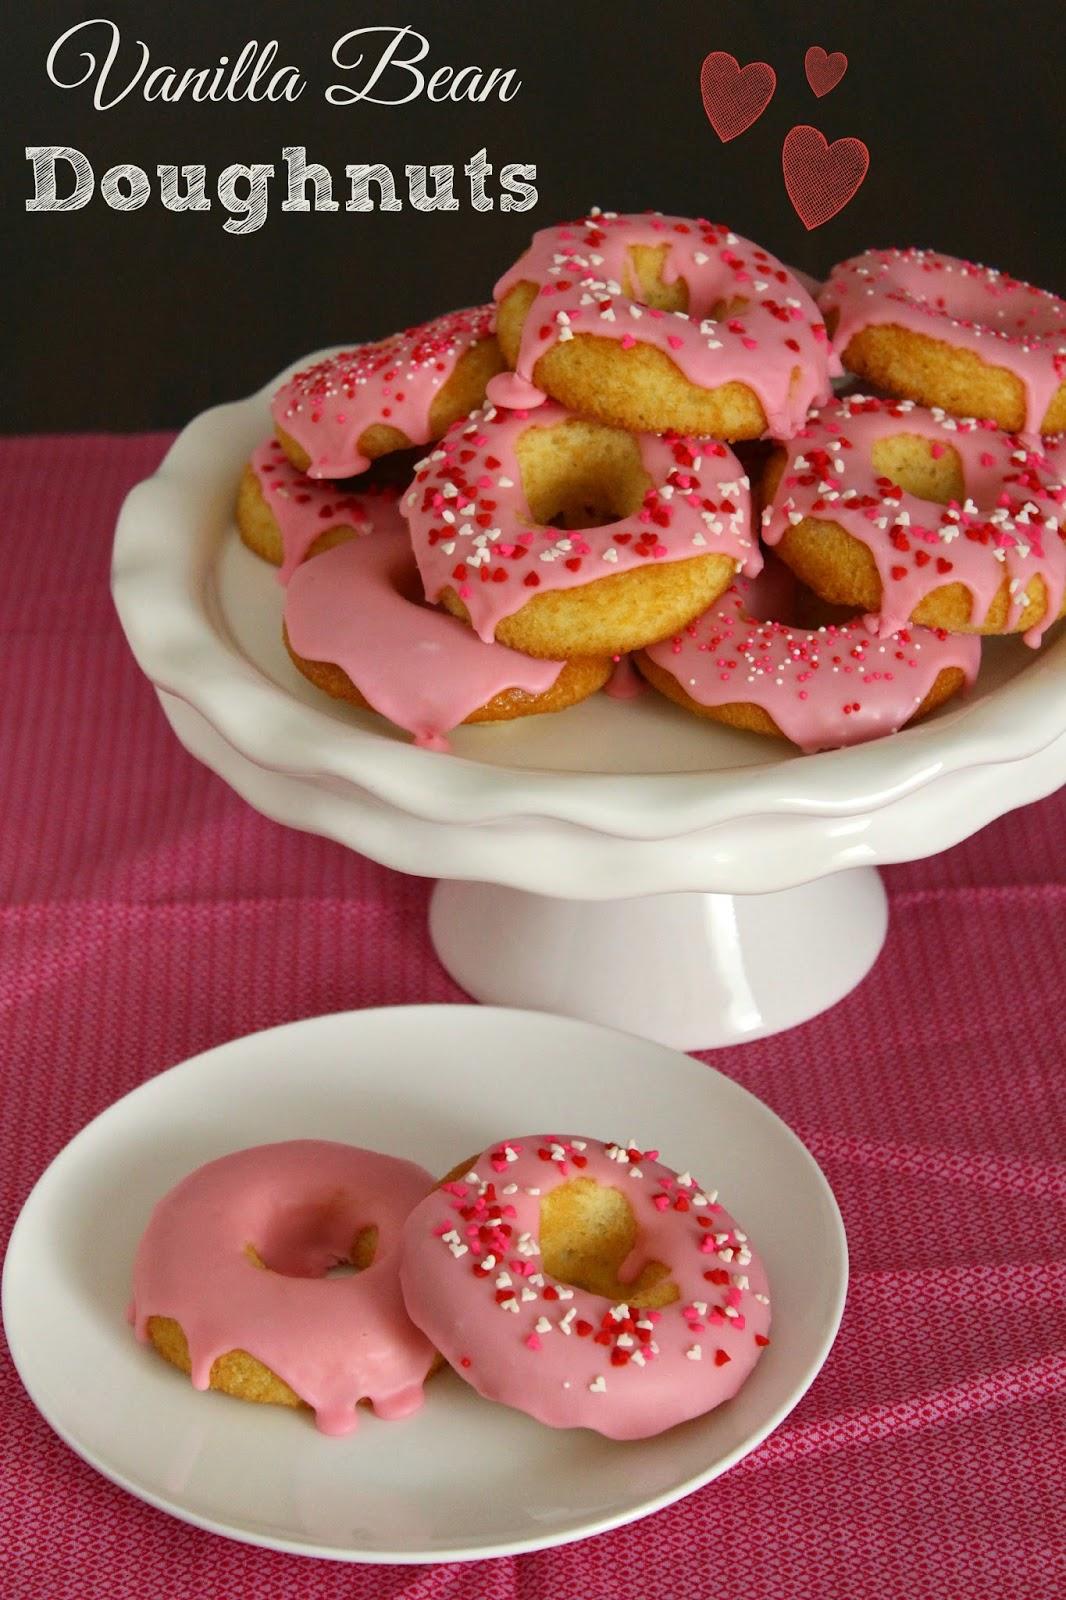 Vanilla Bean Doughnut from LoveandConfections.com